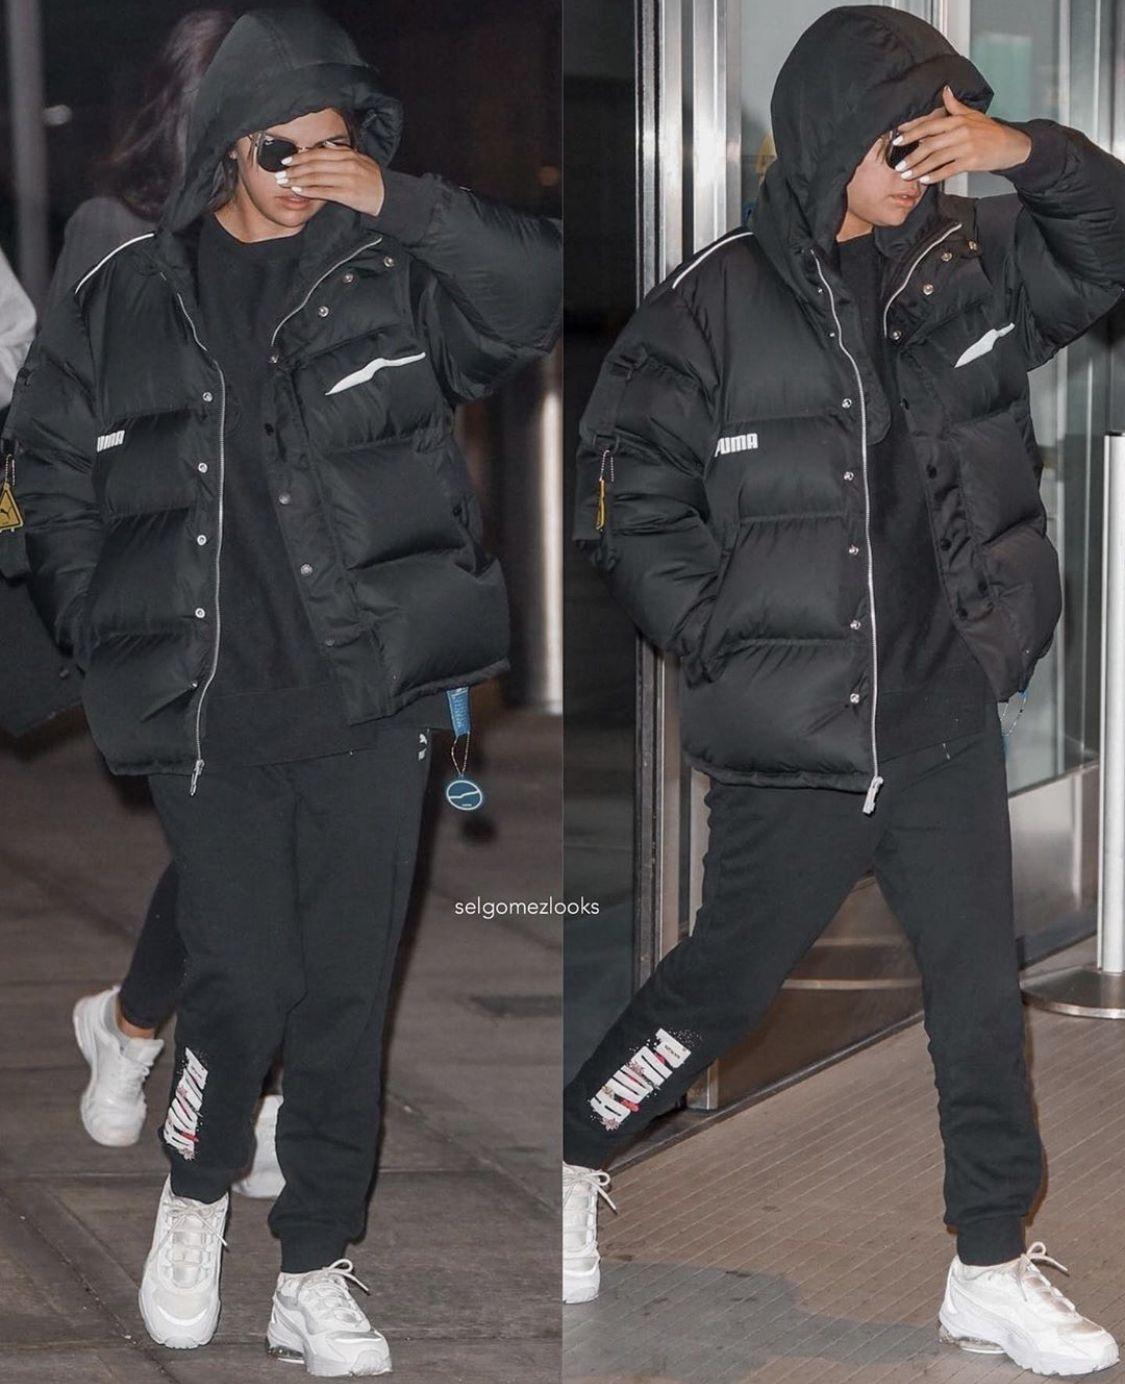 Pin By Mary On Selena Gomez Outfits Selena Gomez The Weeknd Selena Gomez Outfits Winter Jackets